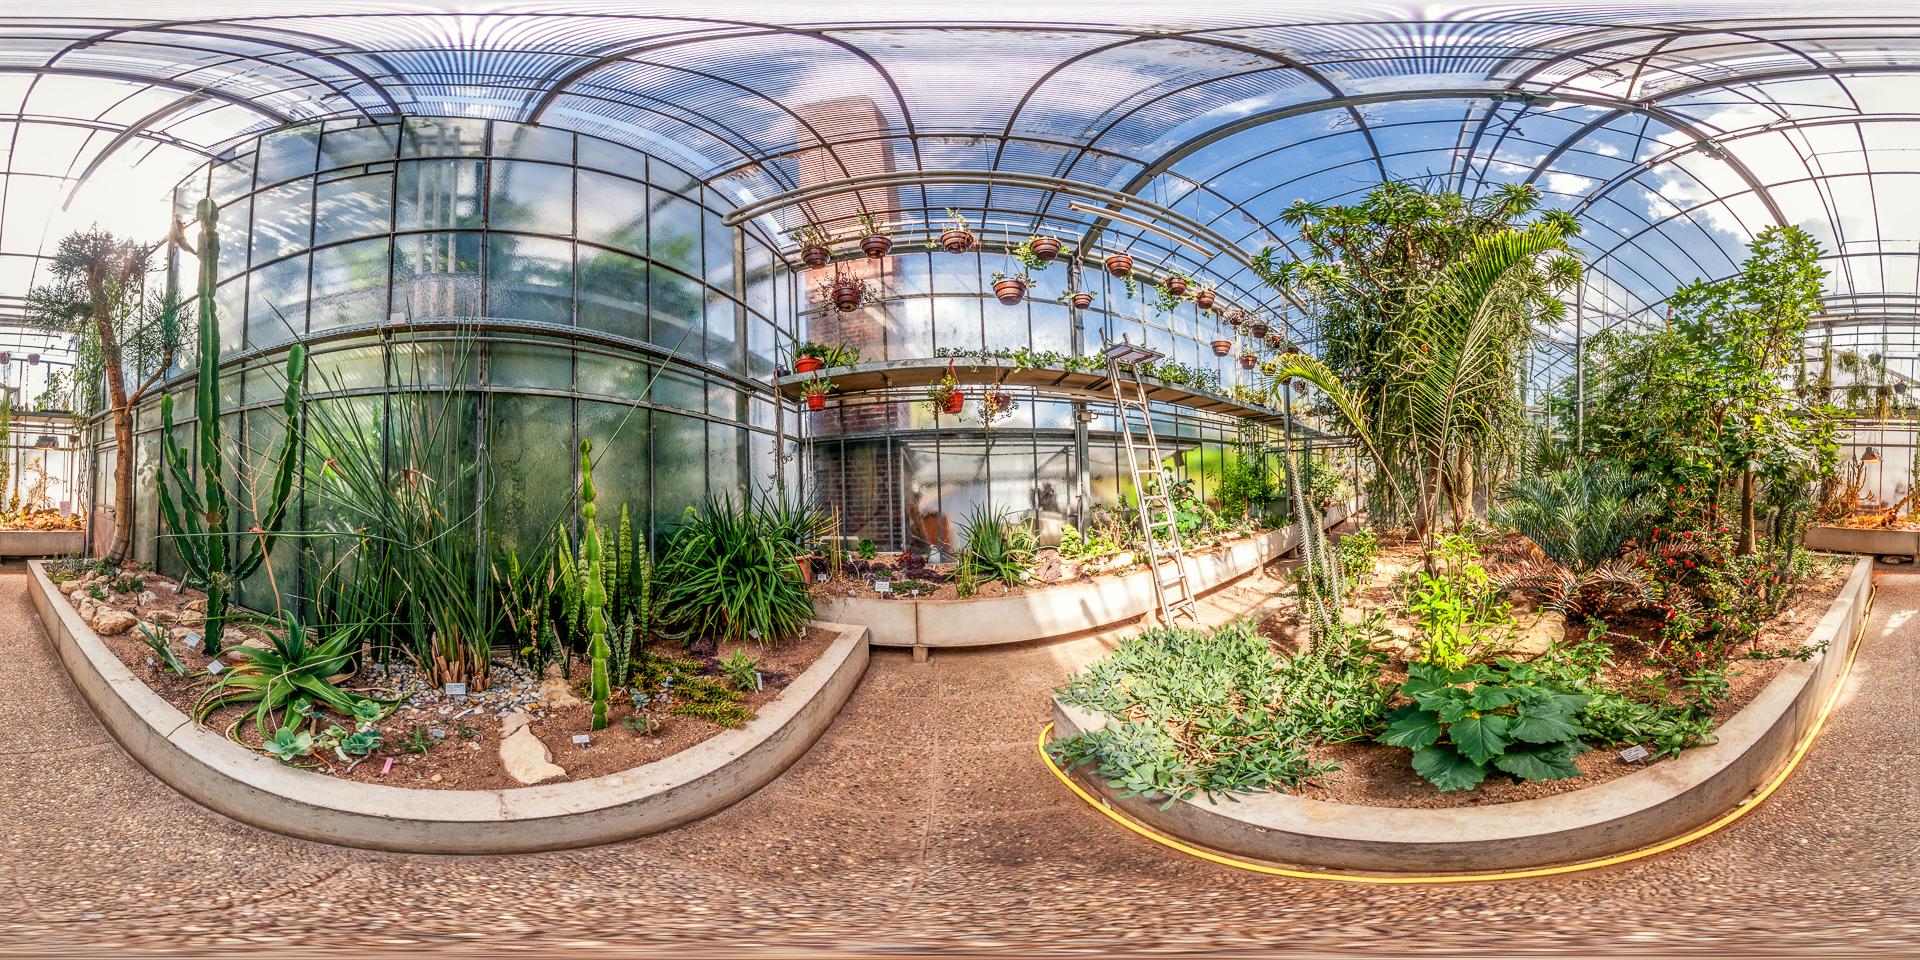 Botanischer-Garten-Darmstadt-Sukkukentenhaus